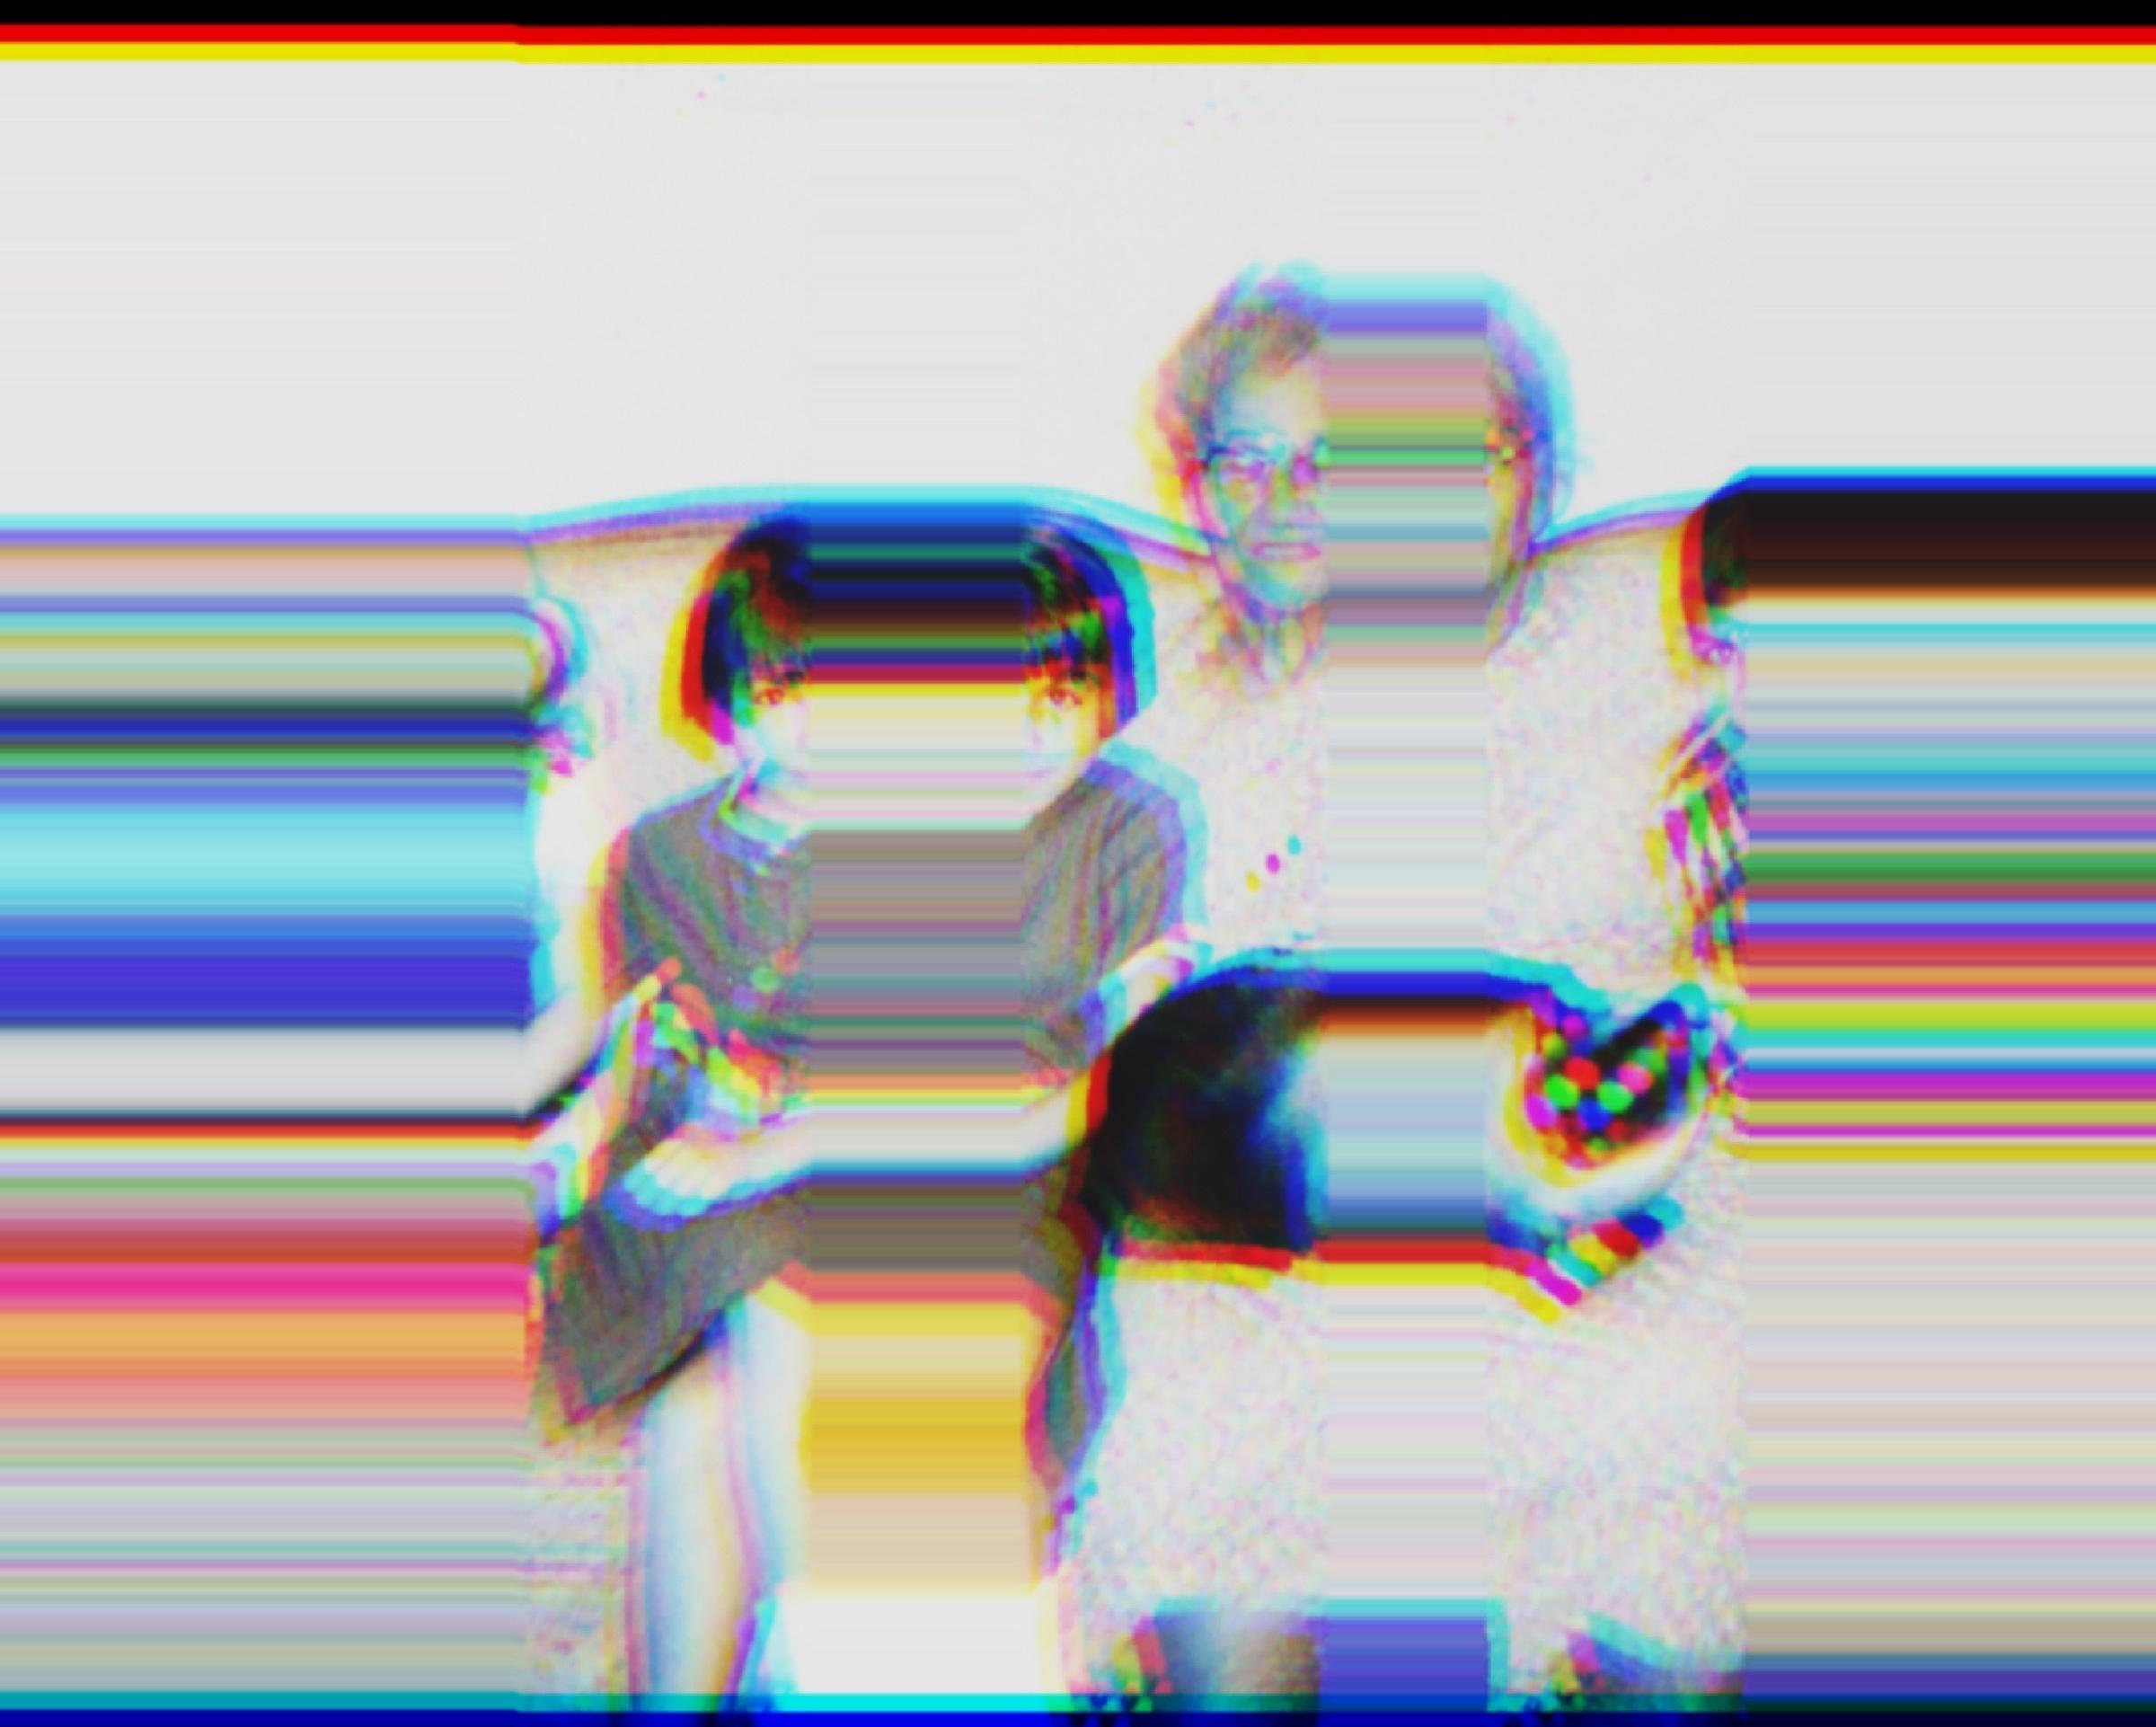 Digital Detritus No. 2    Digitally manipulated image  dimensions variable  2016